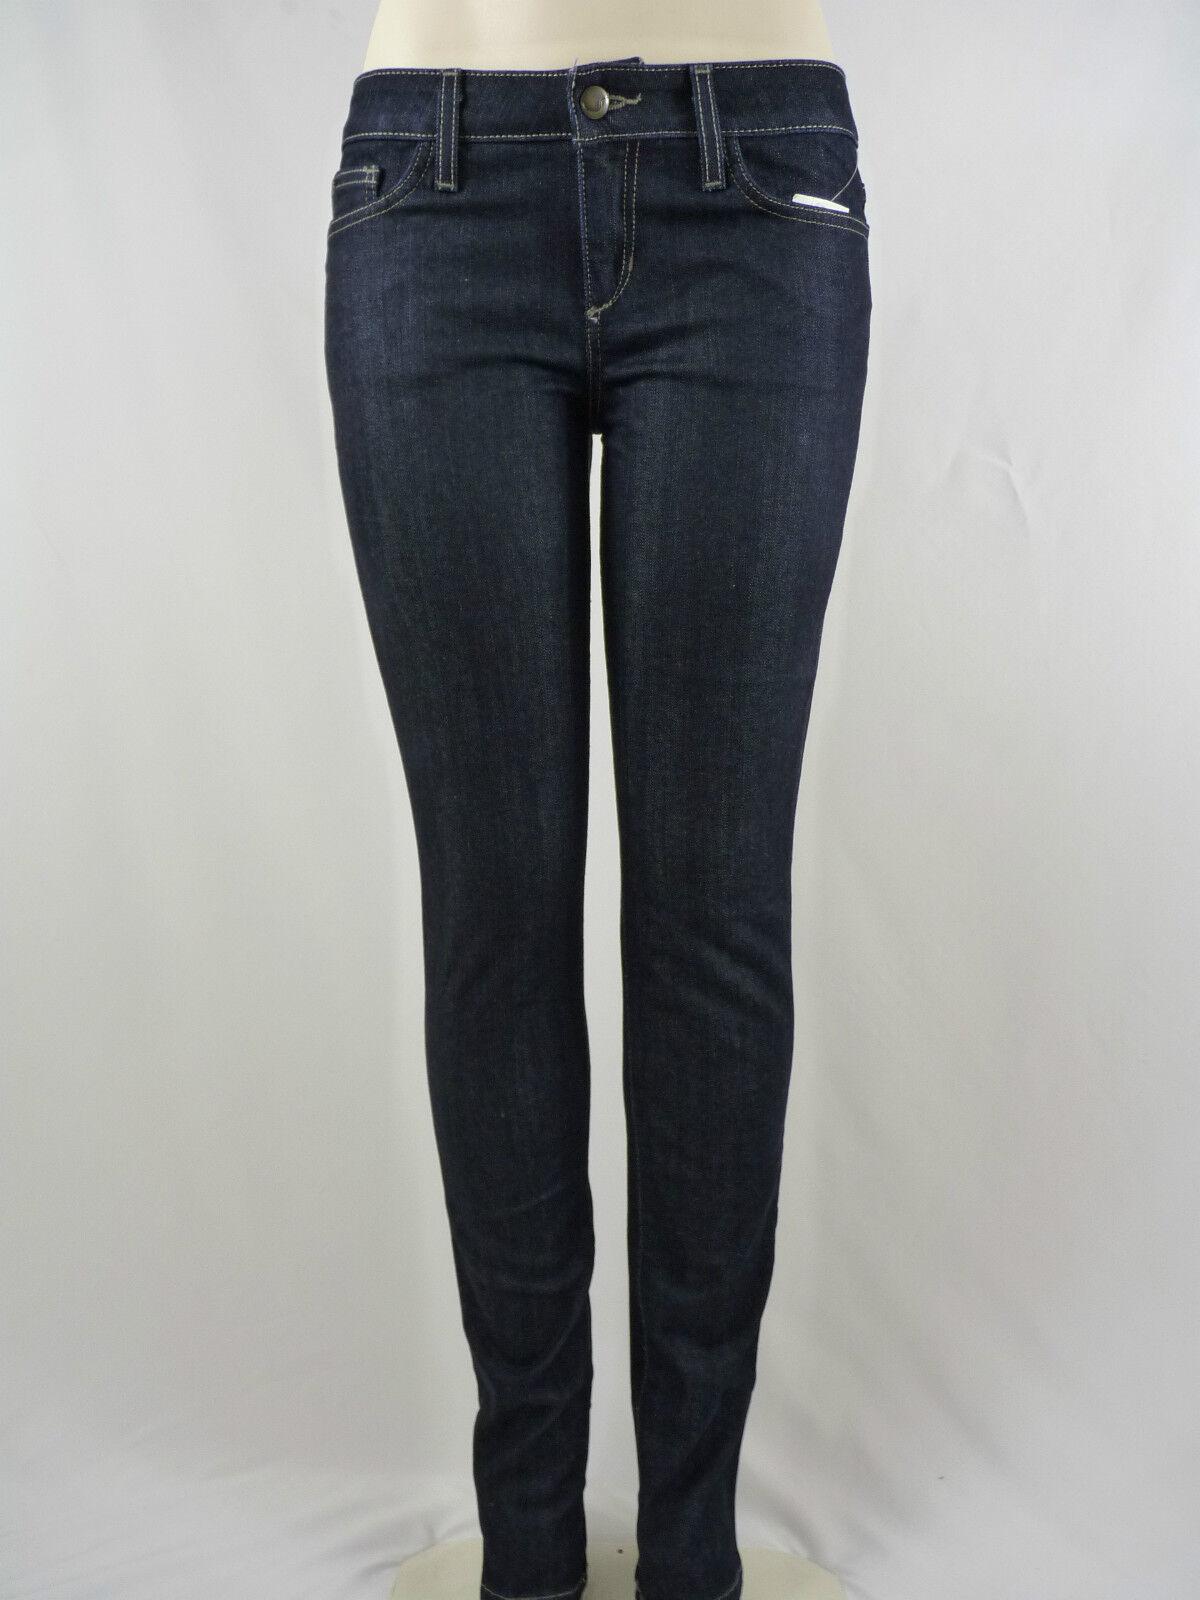 Joe's Jeans Women's CIGARETTE Size 26 Tessa Skinny Pencil Leg Brand New